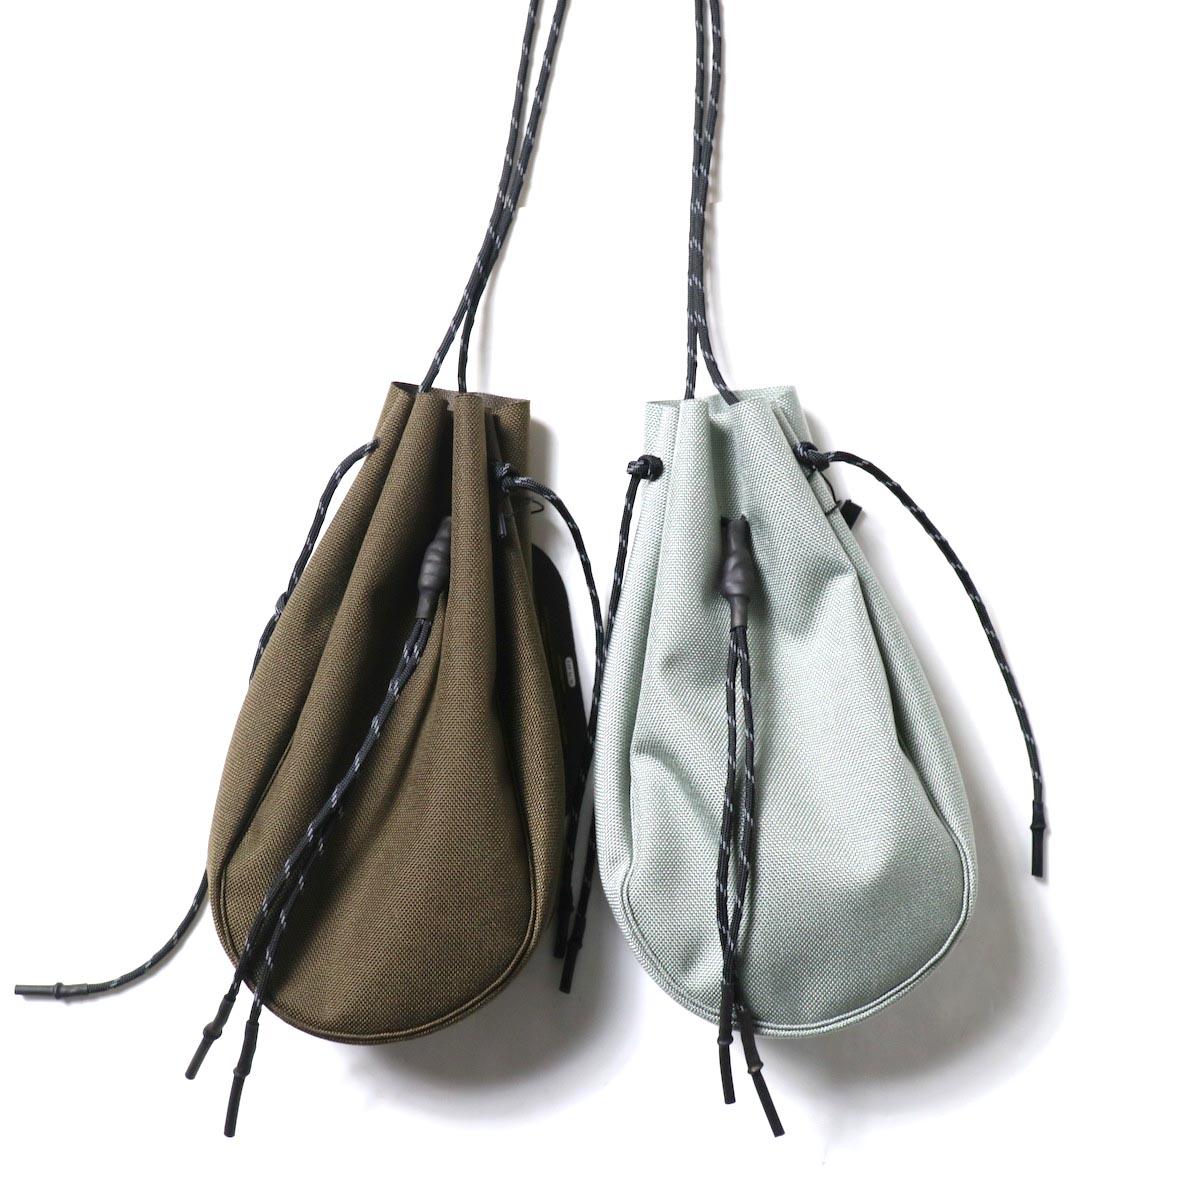 吉岡衣料店 / drawstring bag -L-. (左:Brown / 右:gray)